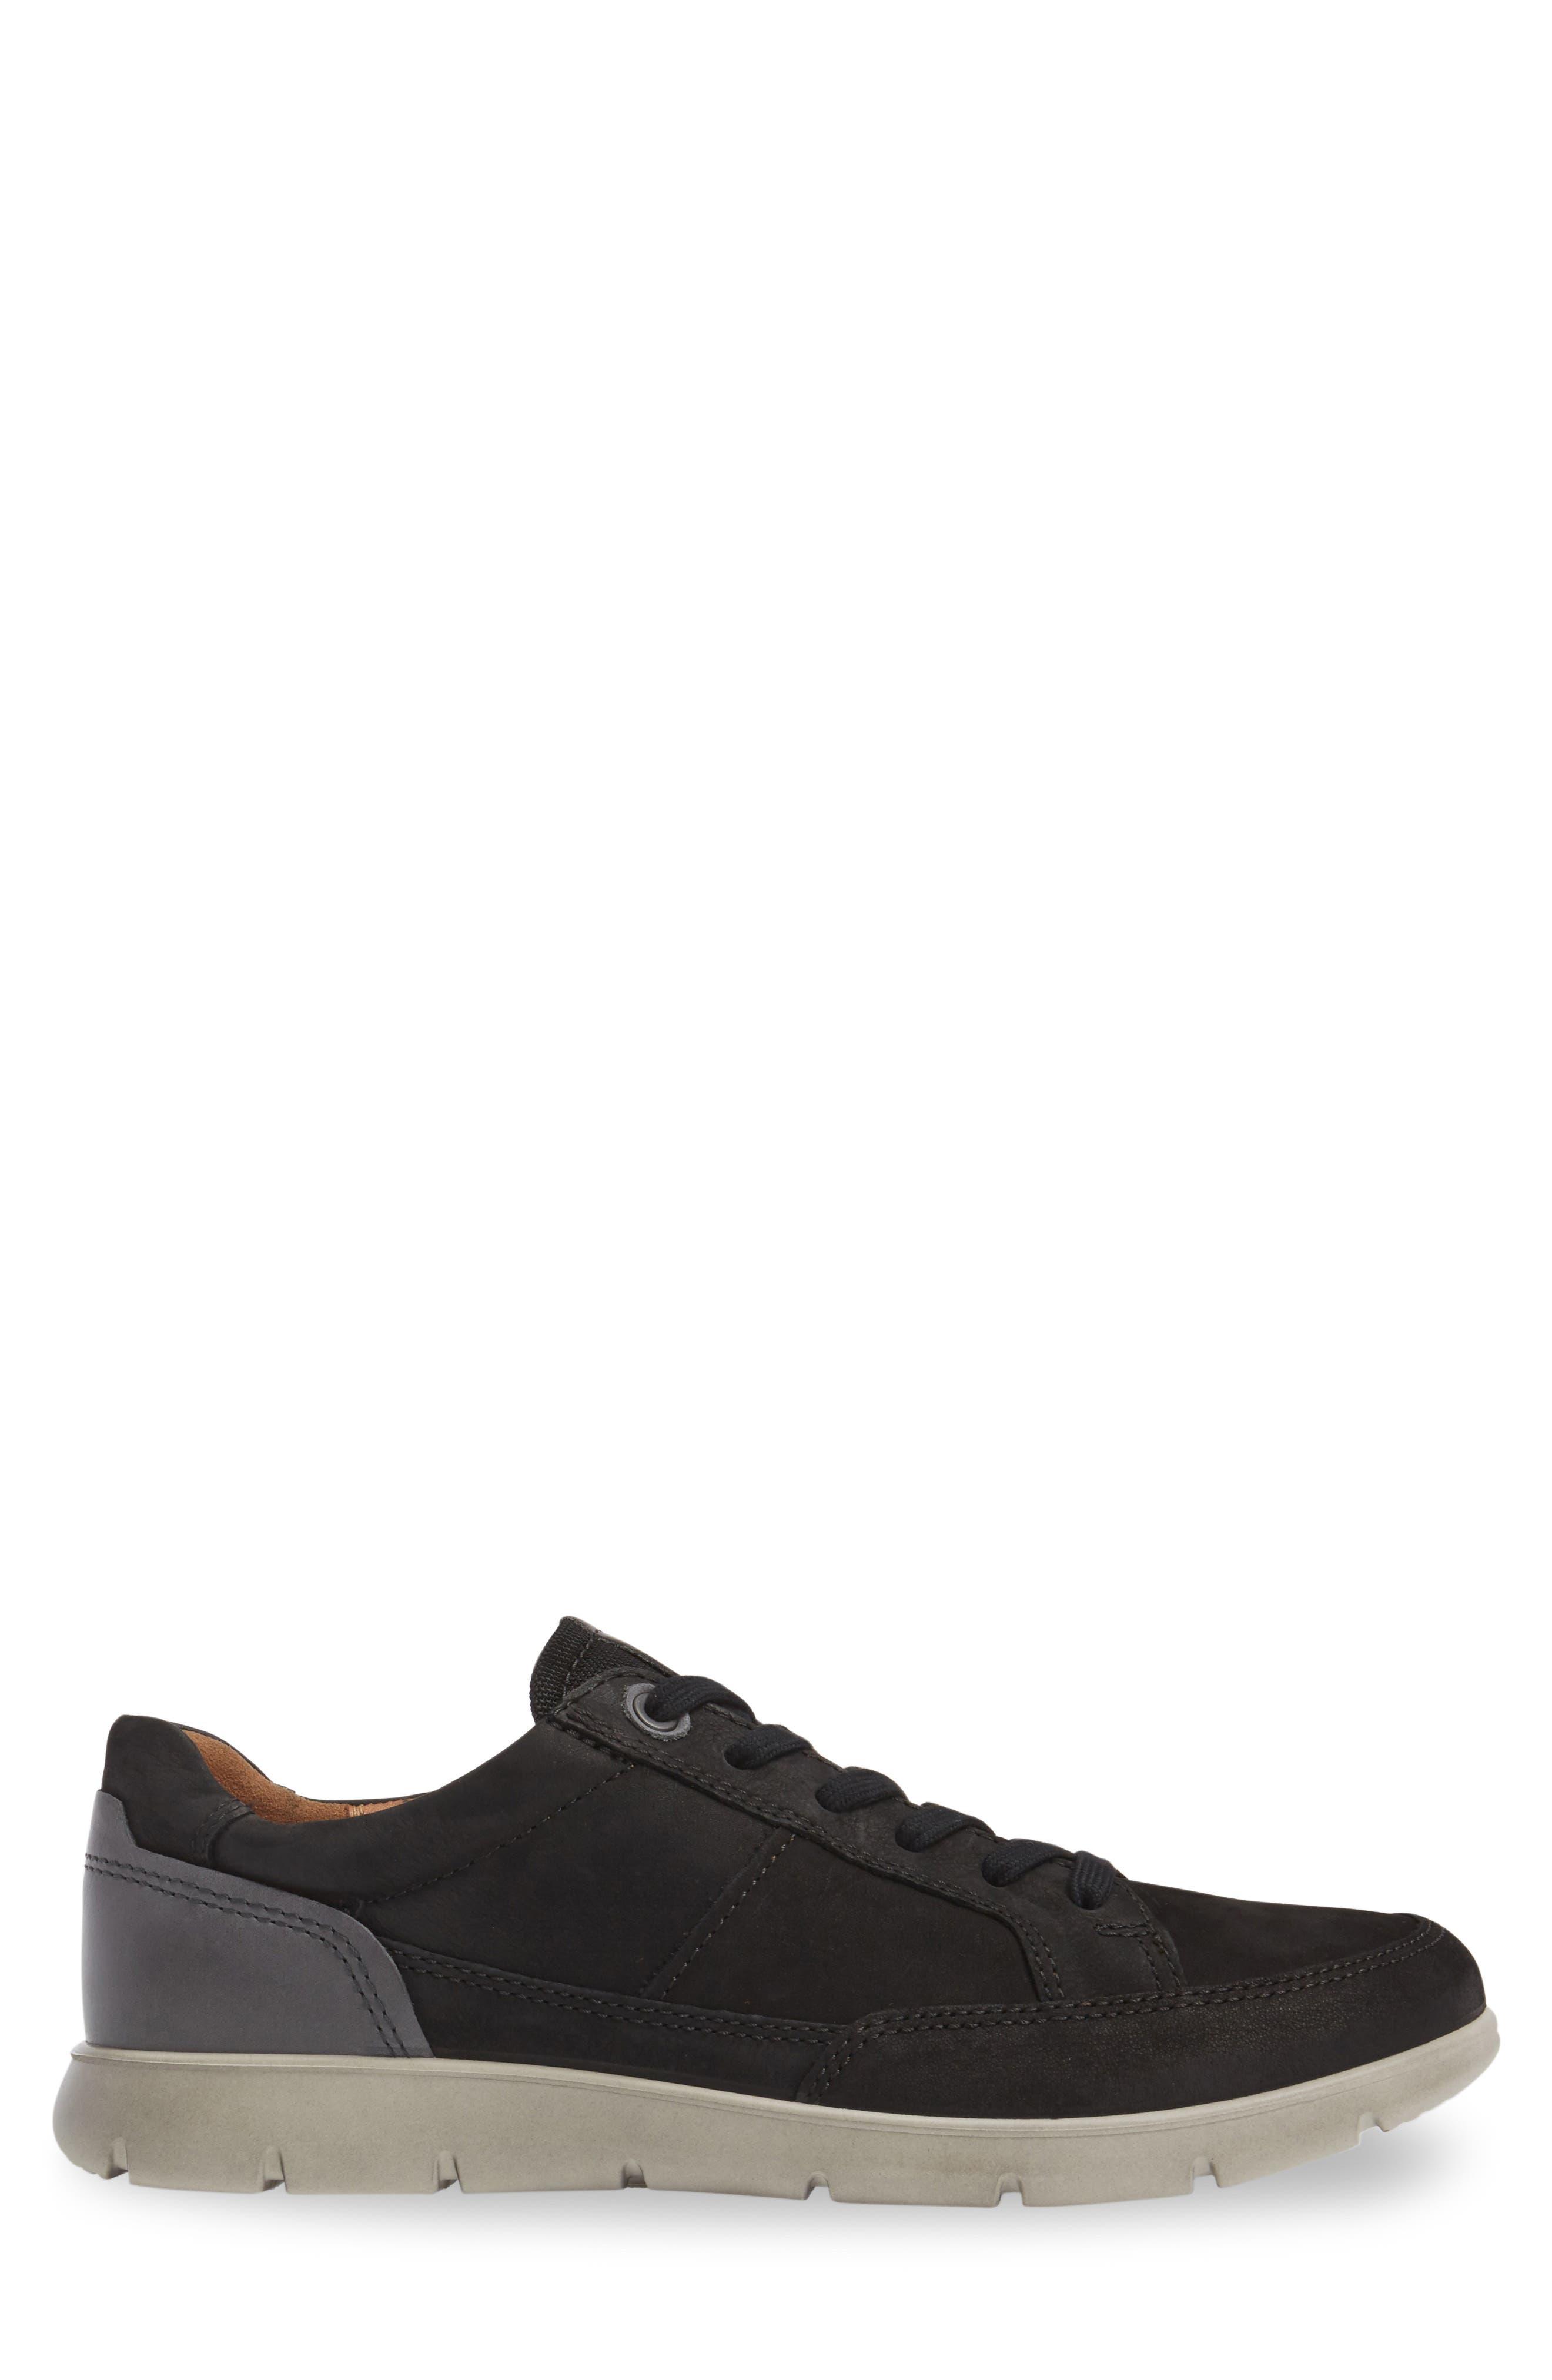 Iowa Neo Sneaker,                             Alternate thumbnail 5, color,